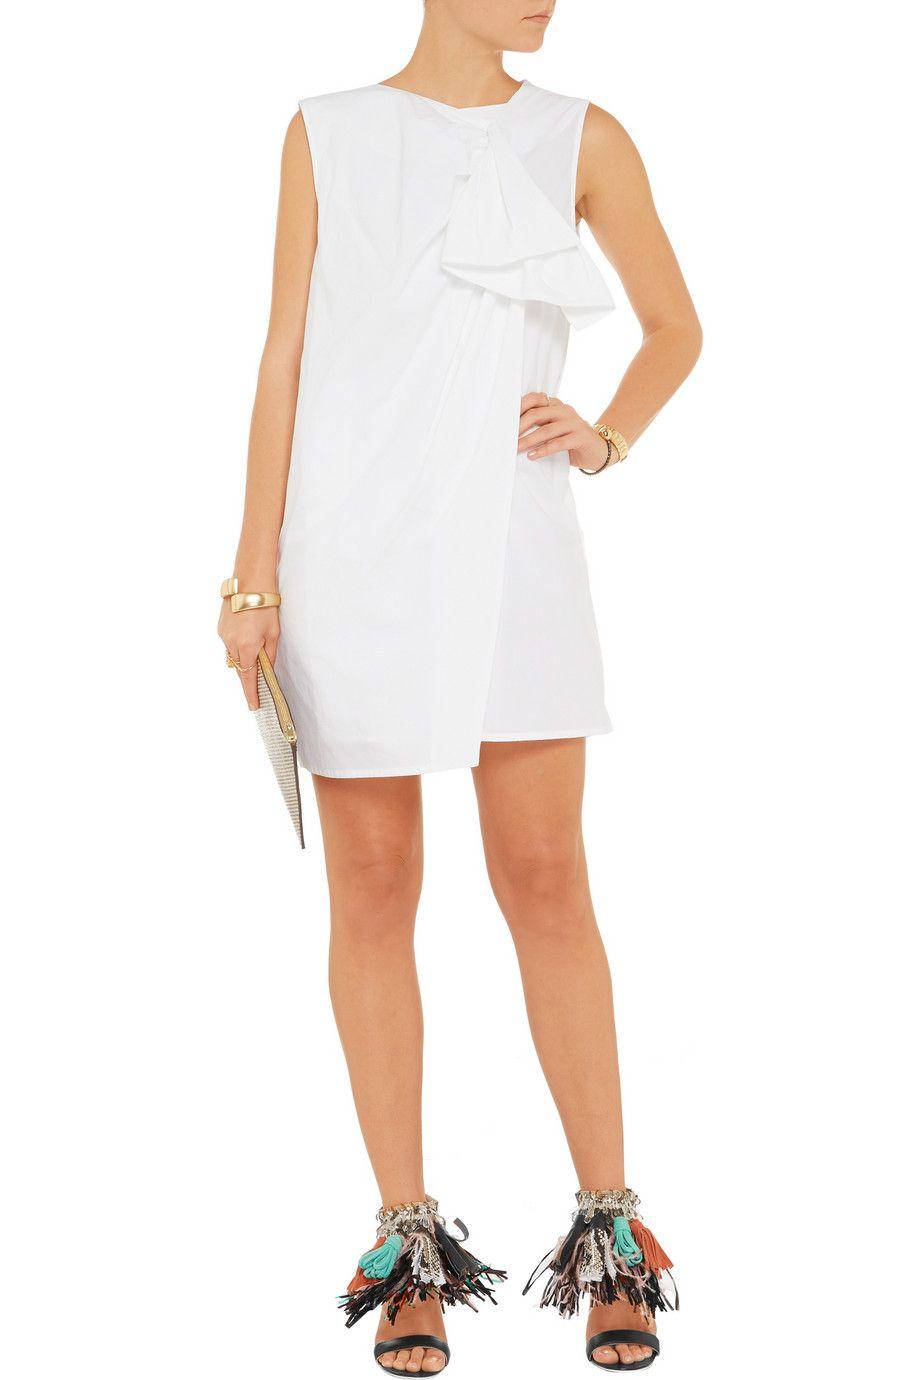 MSGMDraped cotton mini dress